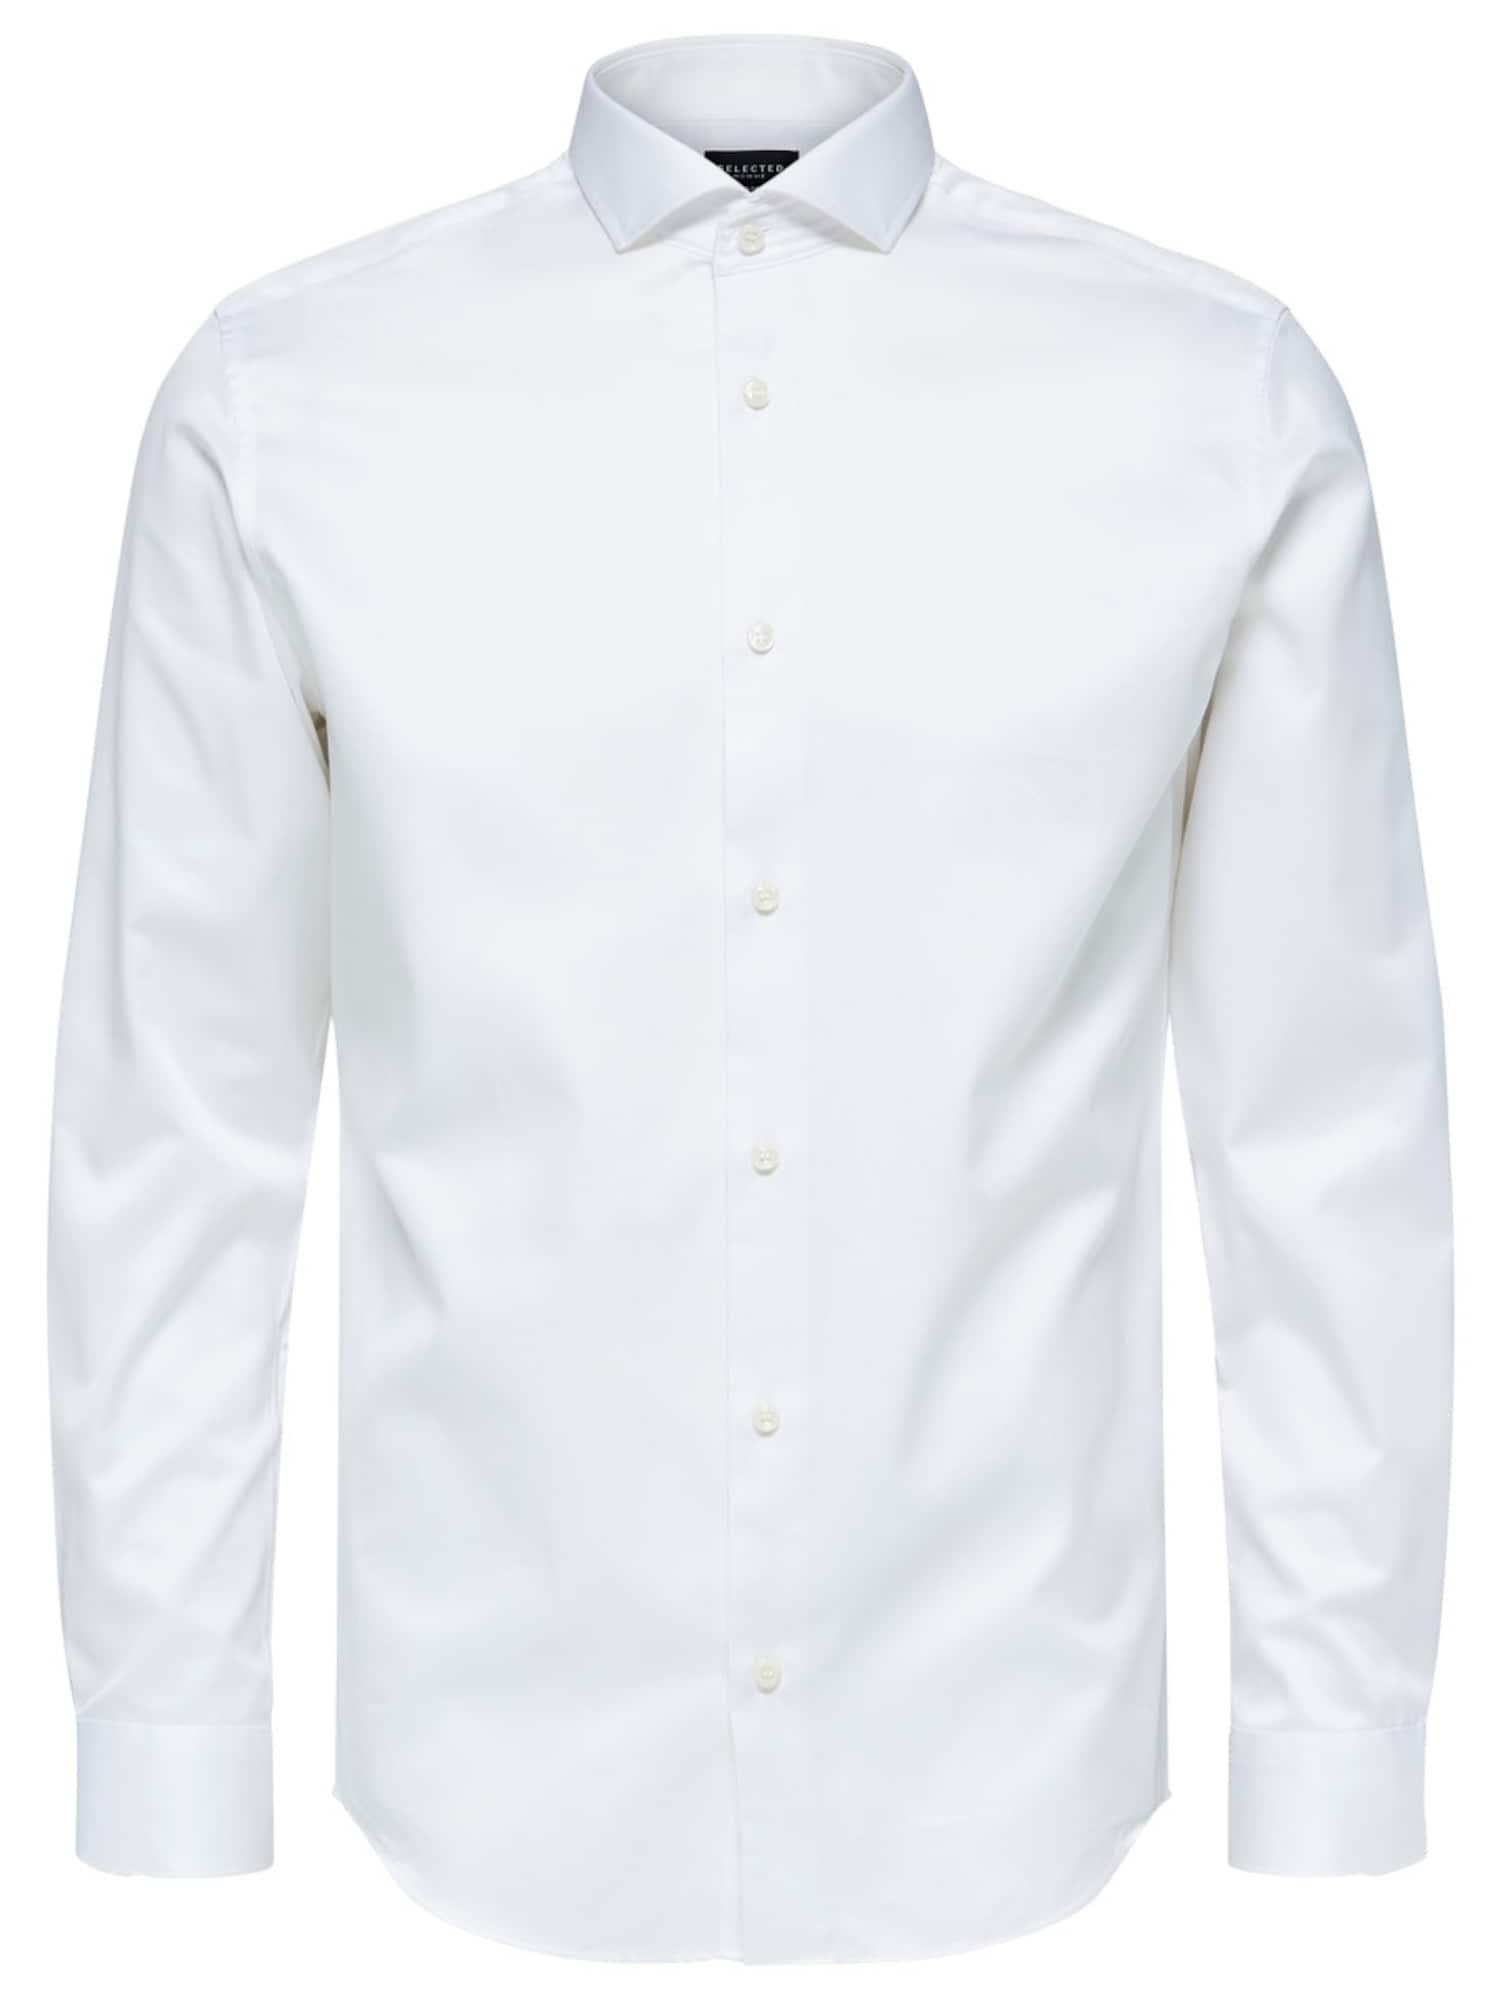 SELECTED HOMME Marškiniai balta